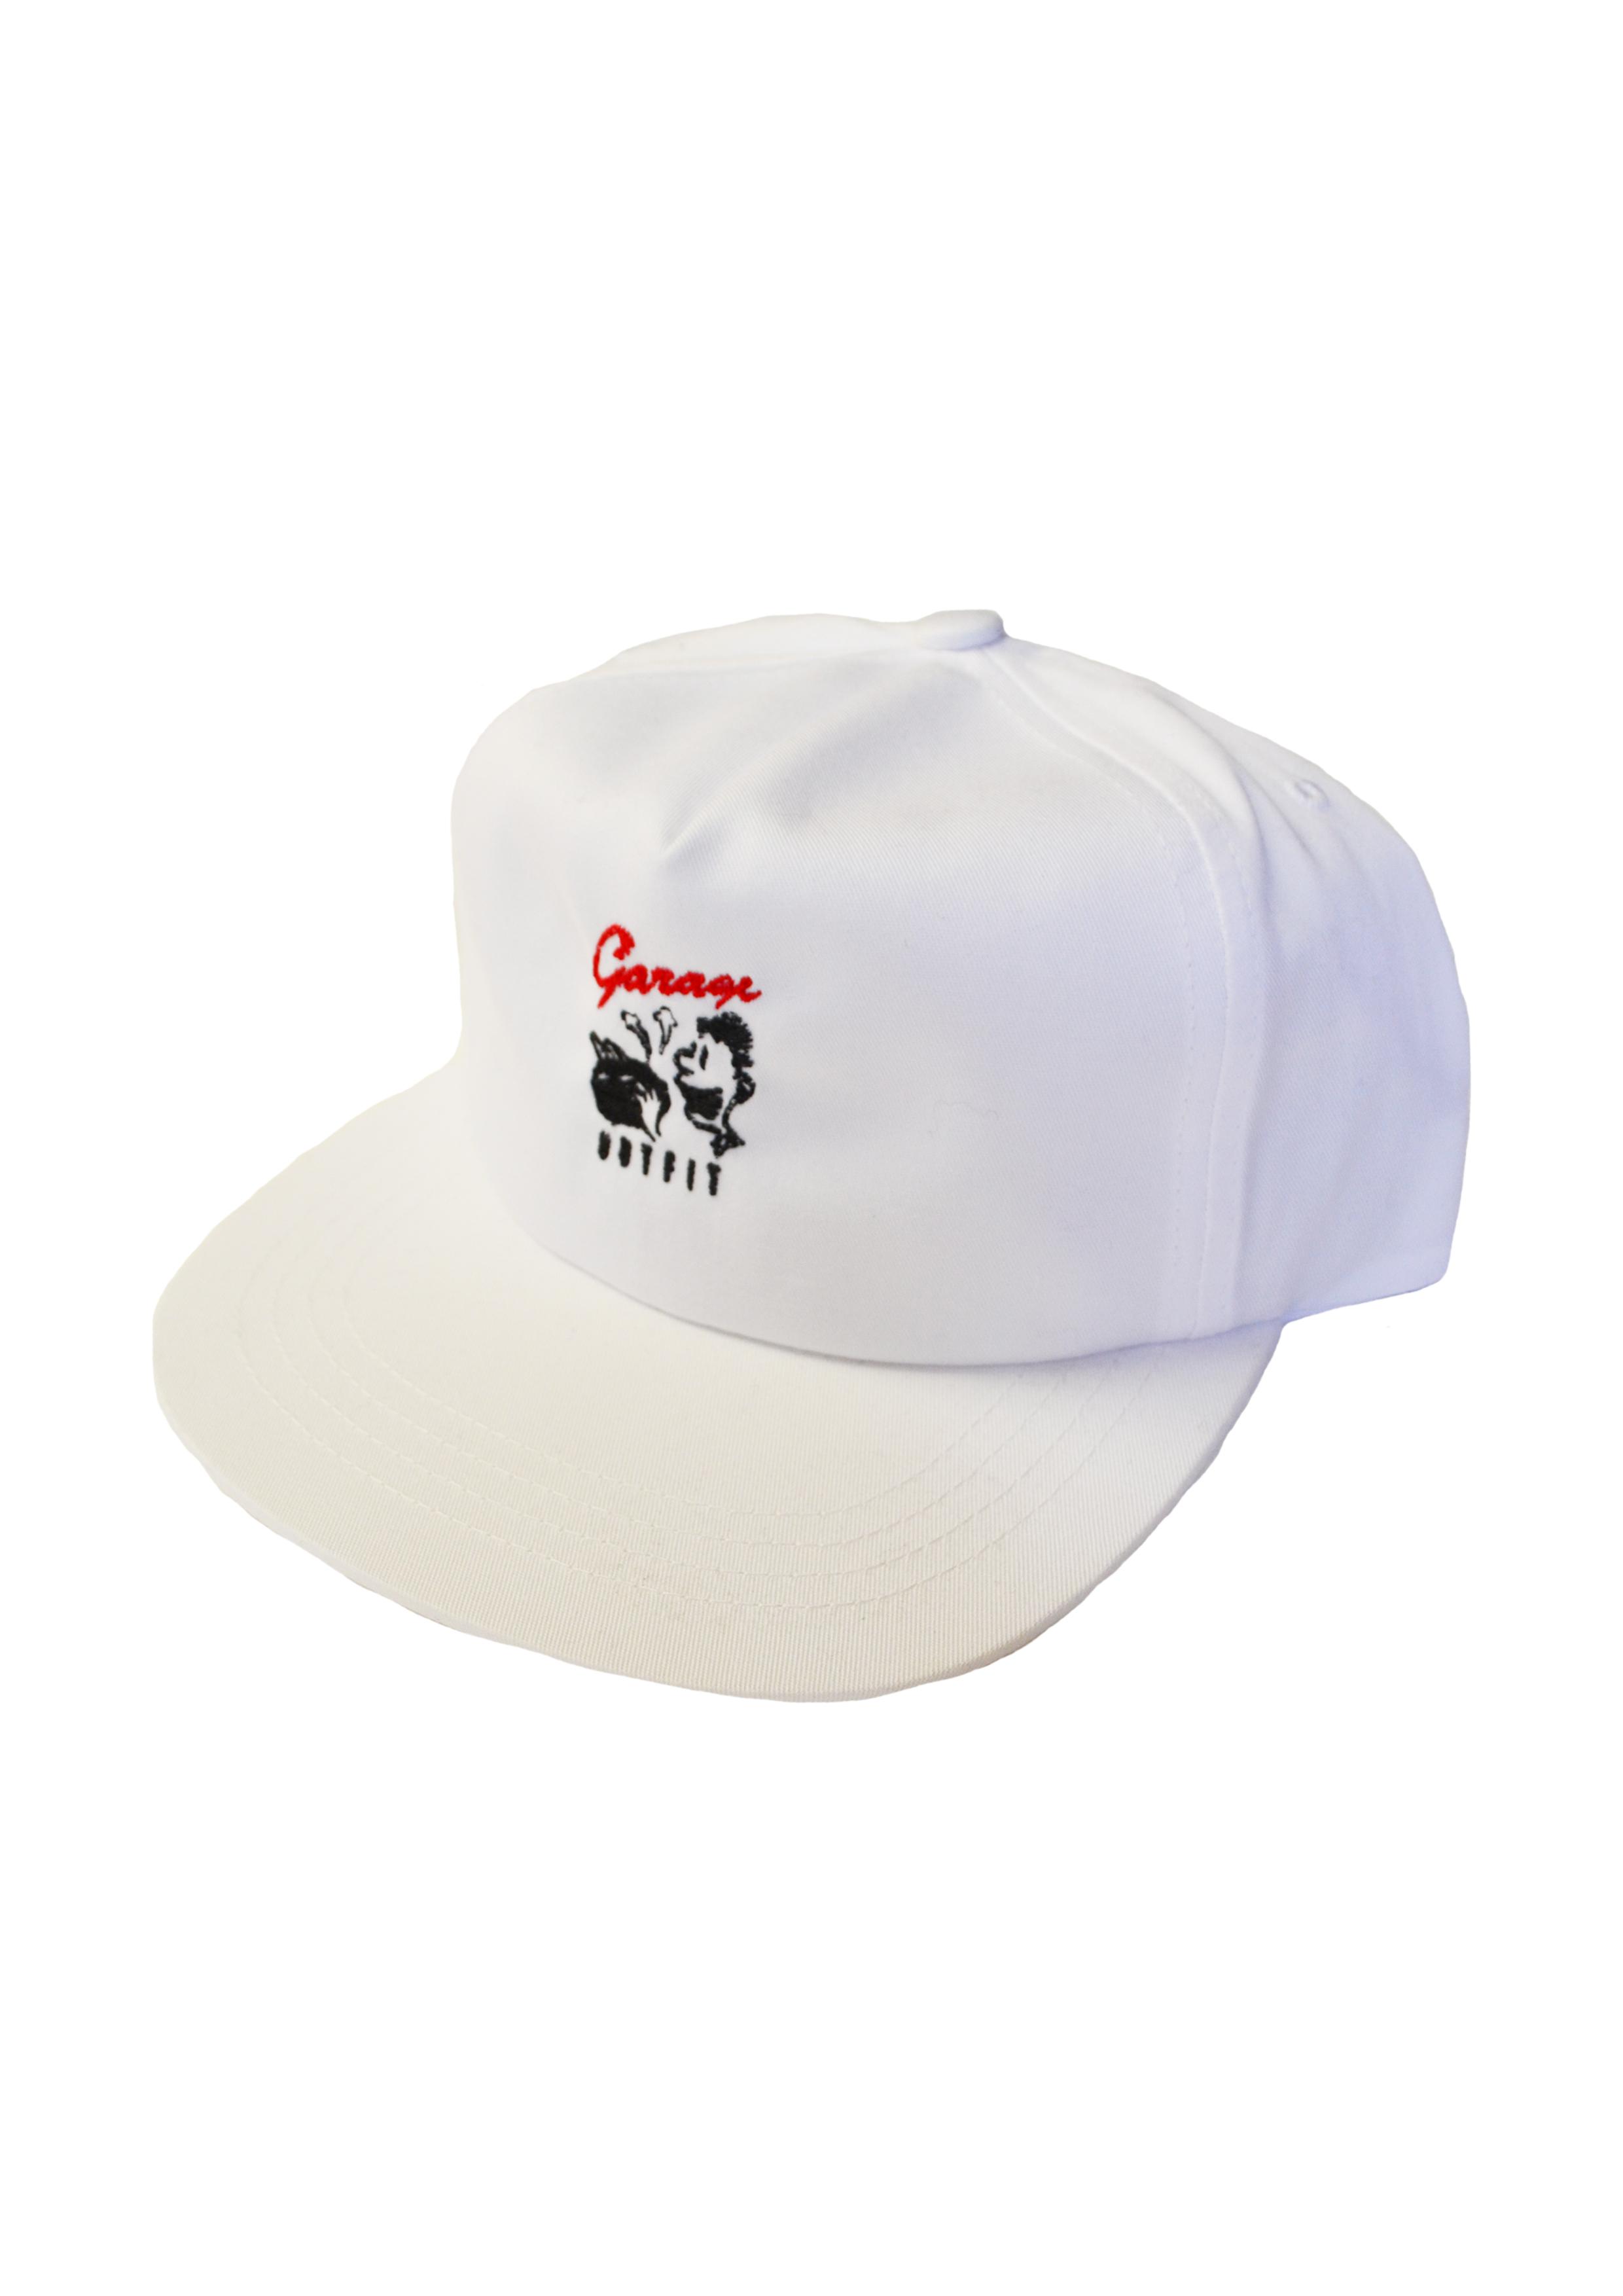 Delicious wheel  cap White